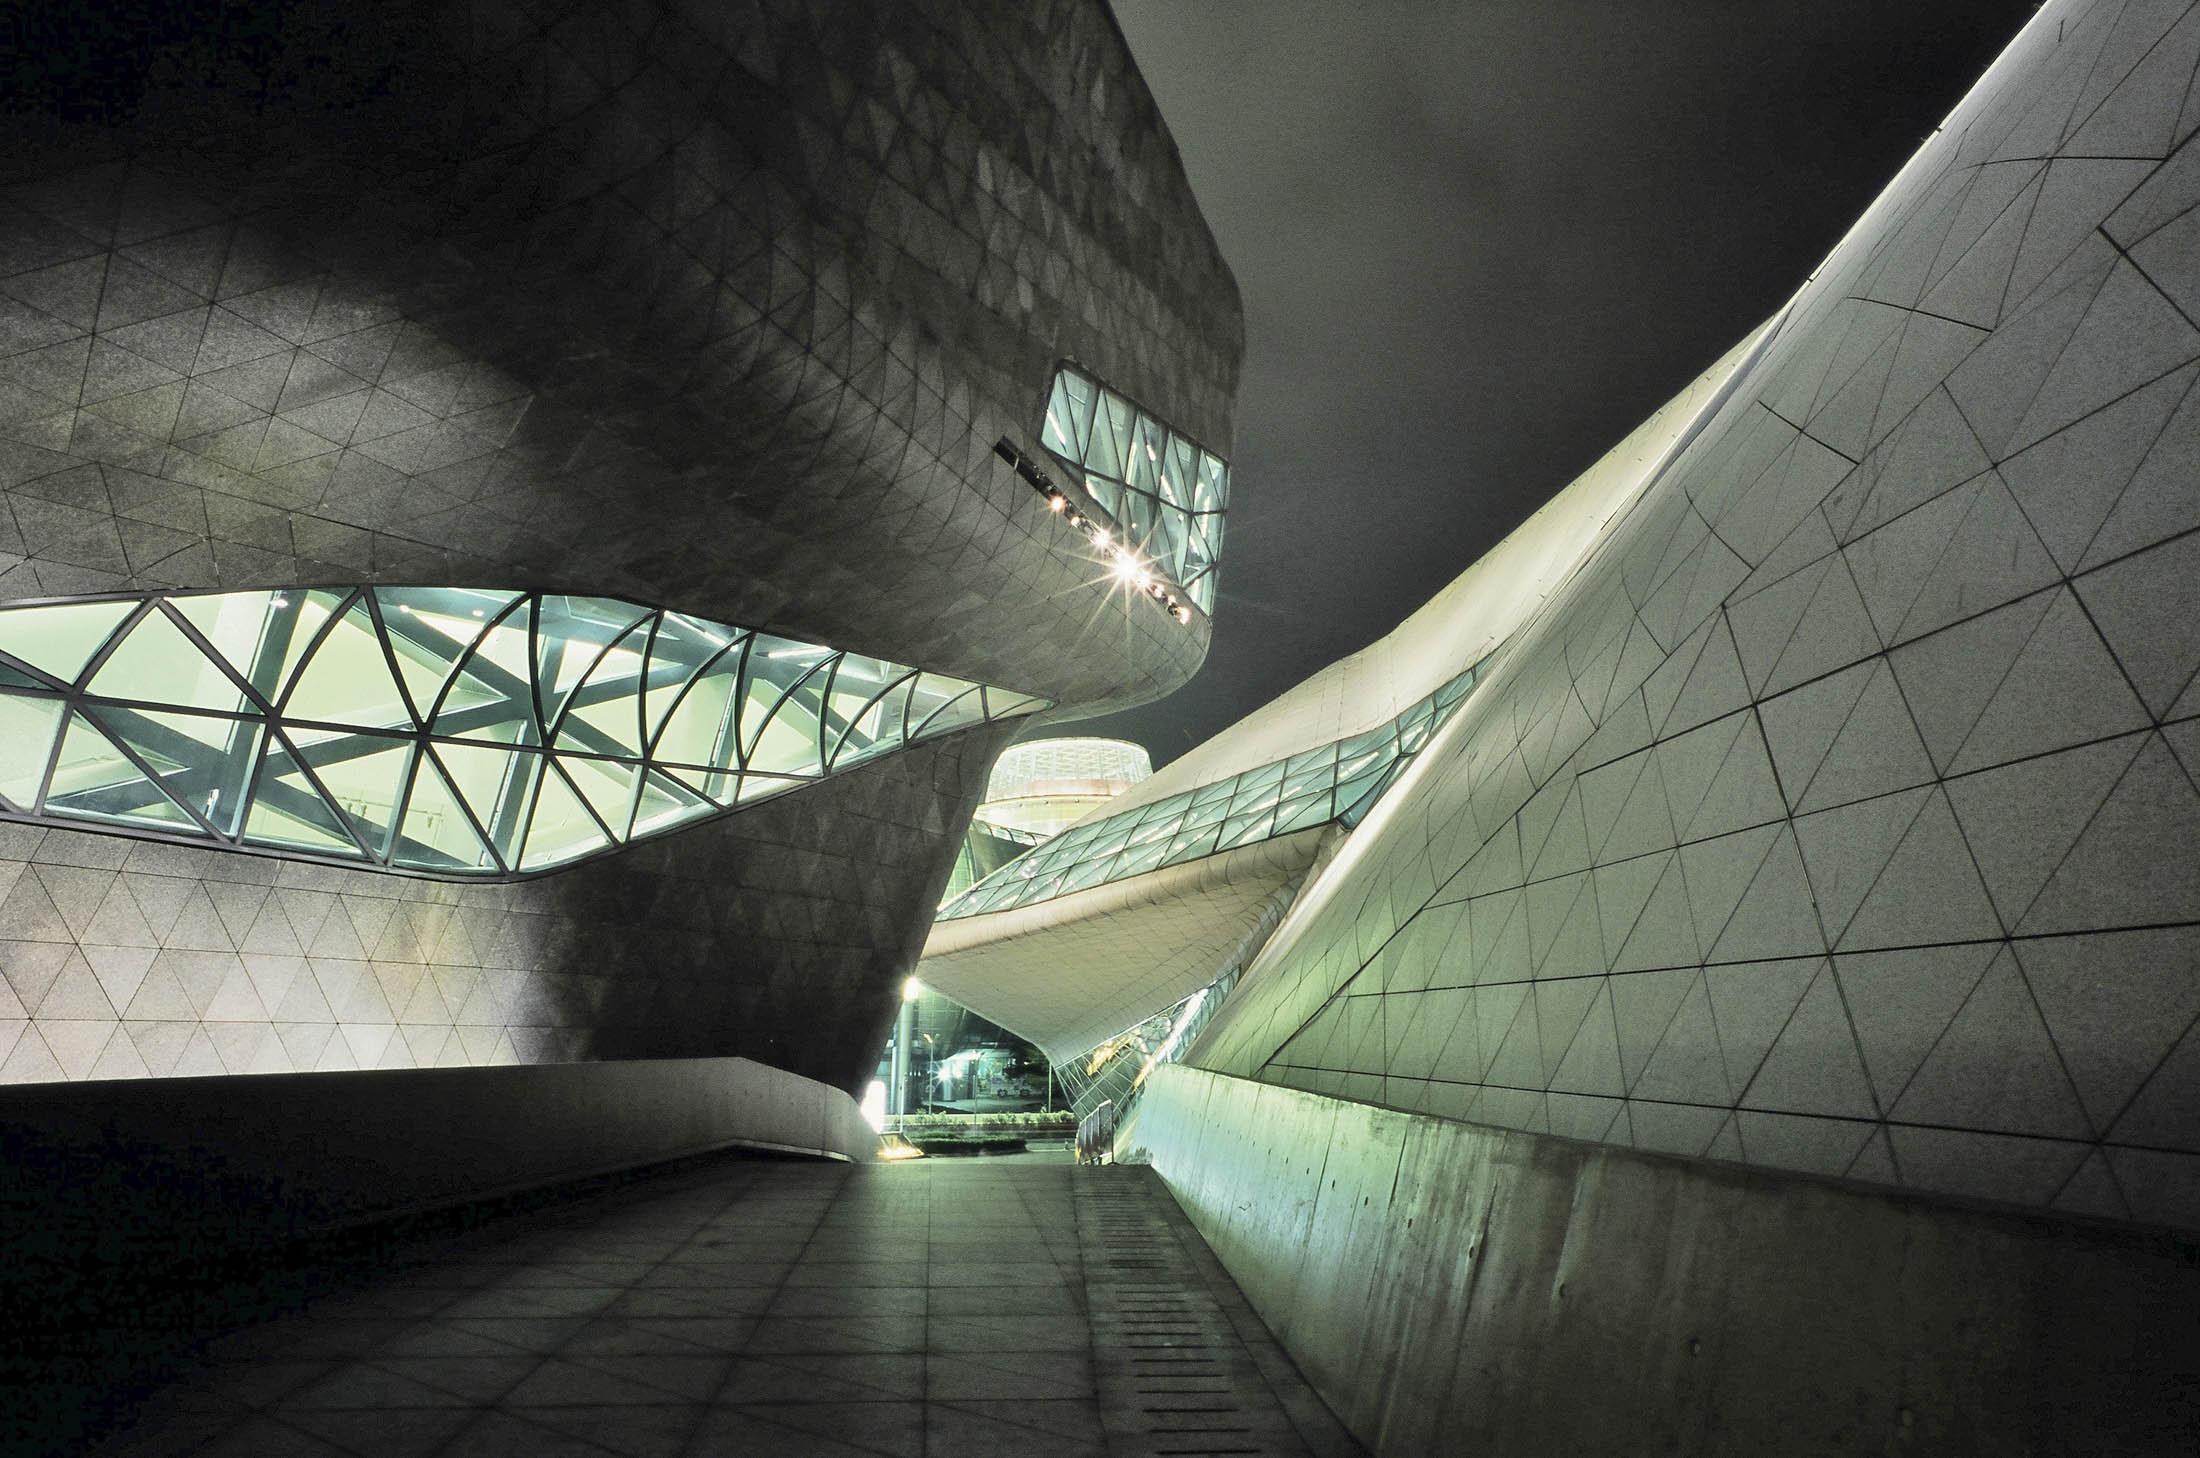 Opera House guangzhou by Zaha Hadid